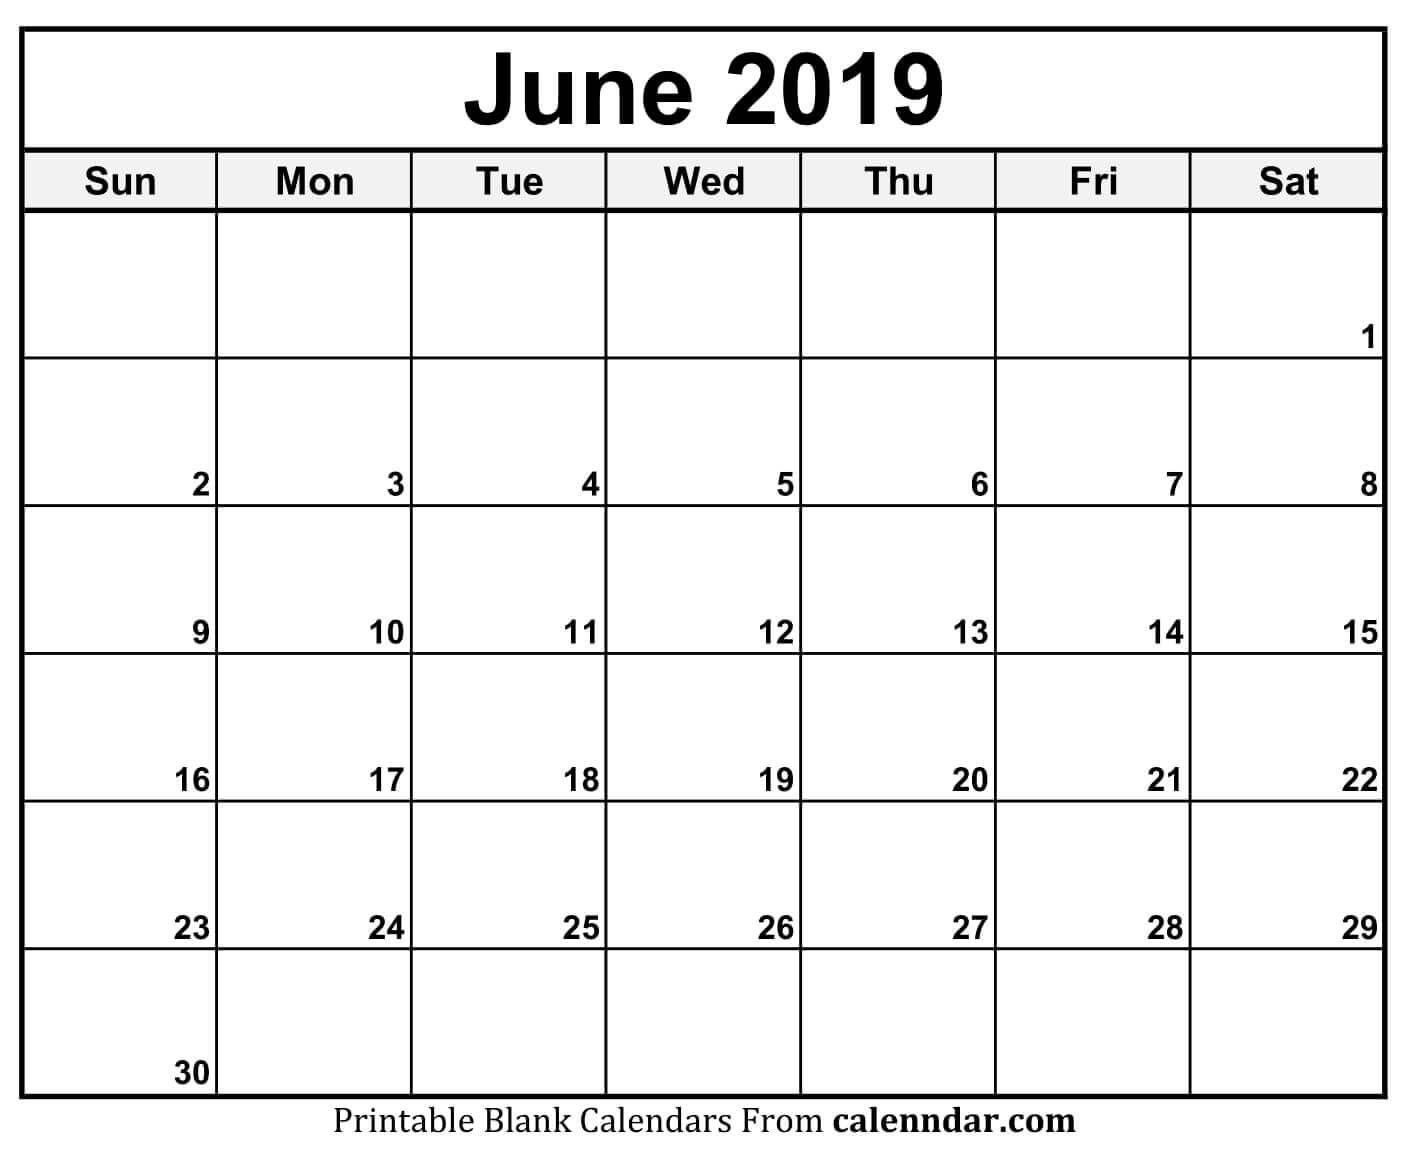 June 2019 Calendar Blank Template | Printable Monthly Calendar throughout June Calendar Printable Template